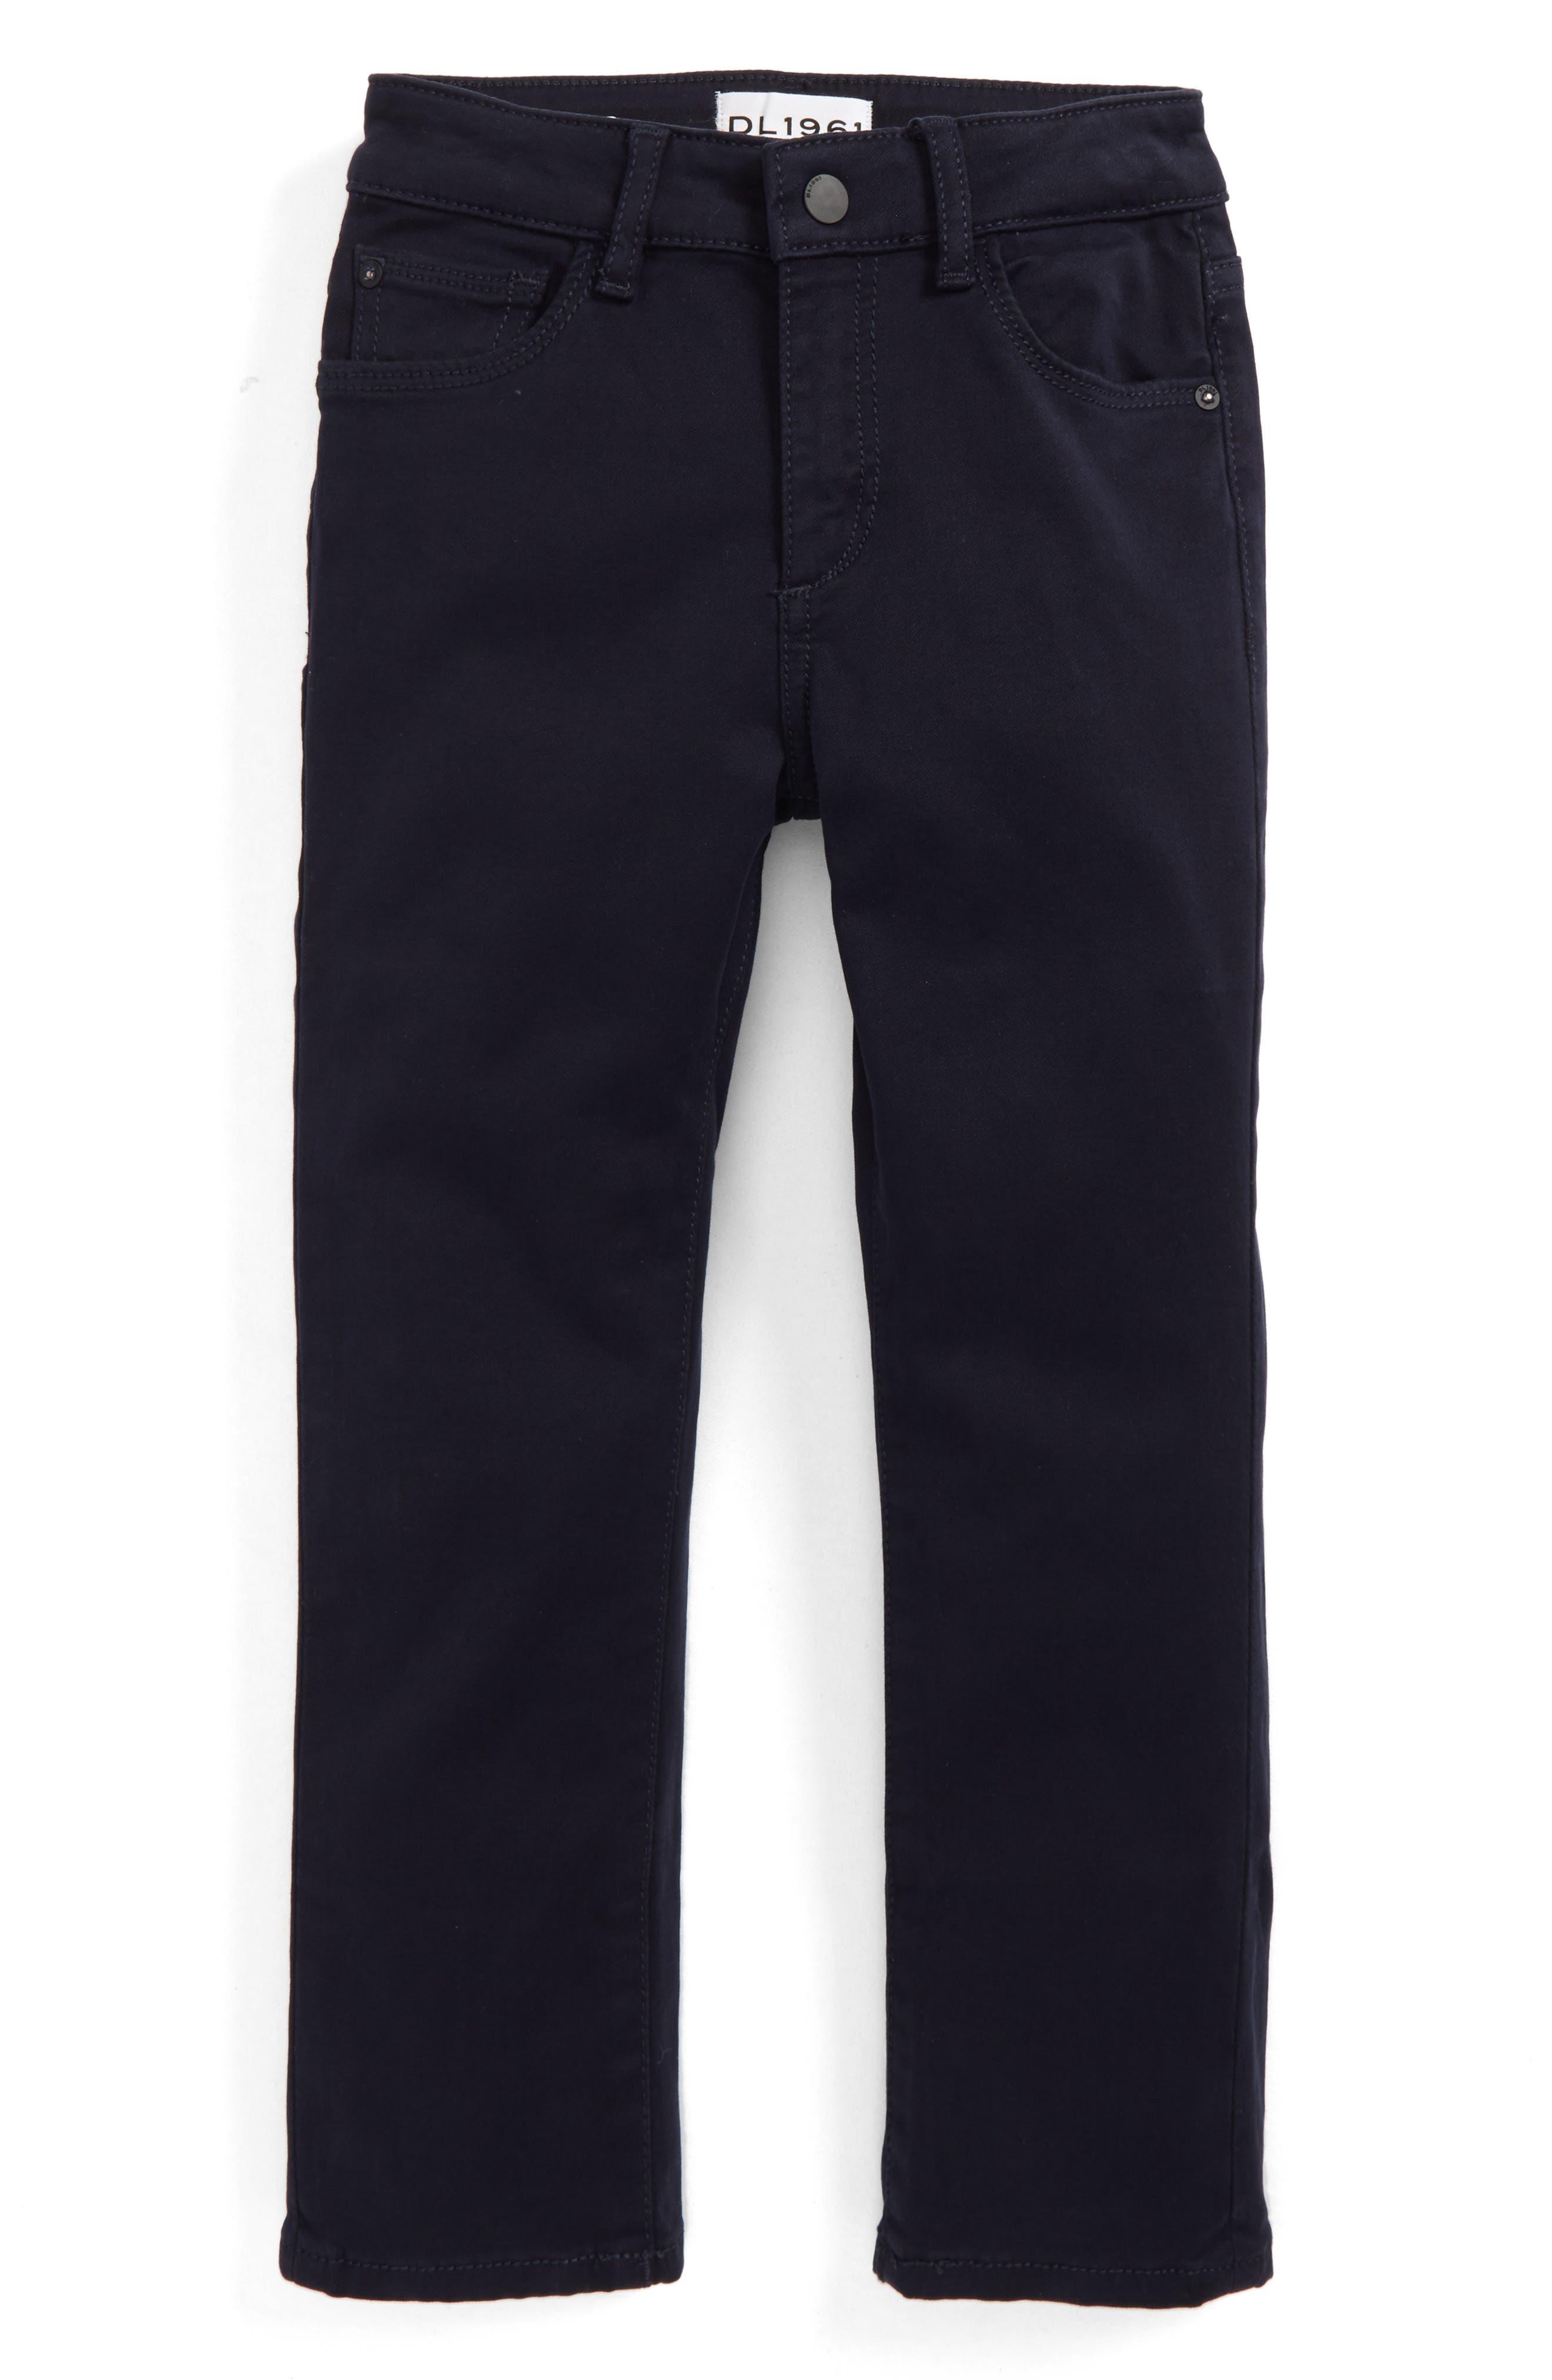 Brady Slim Fit Twill Pants,                             Main thumbnail 1, color,                             410